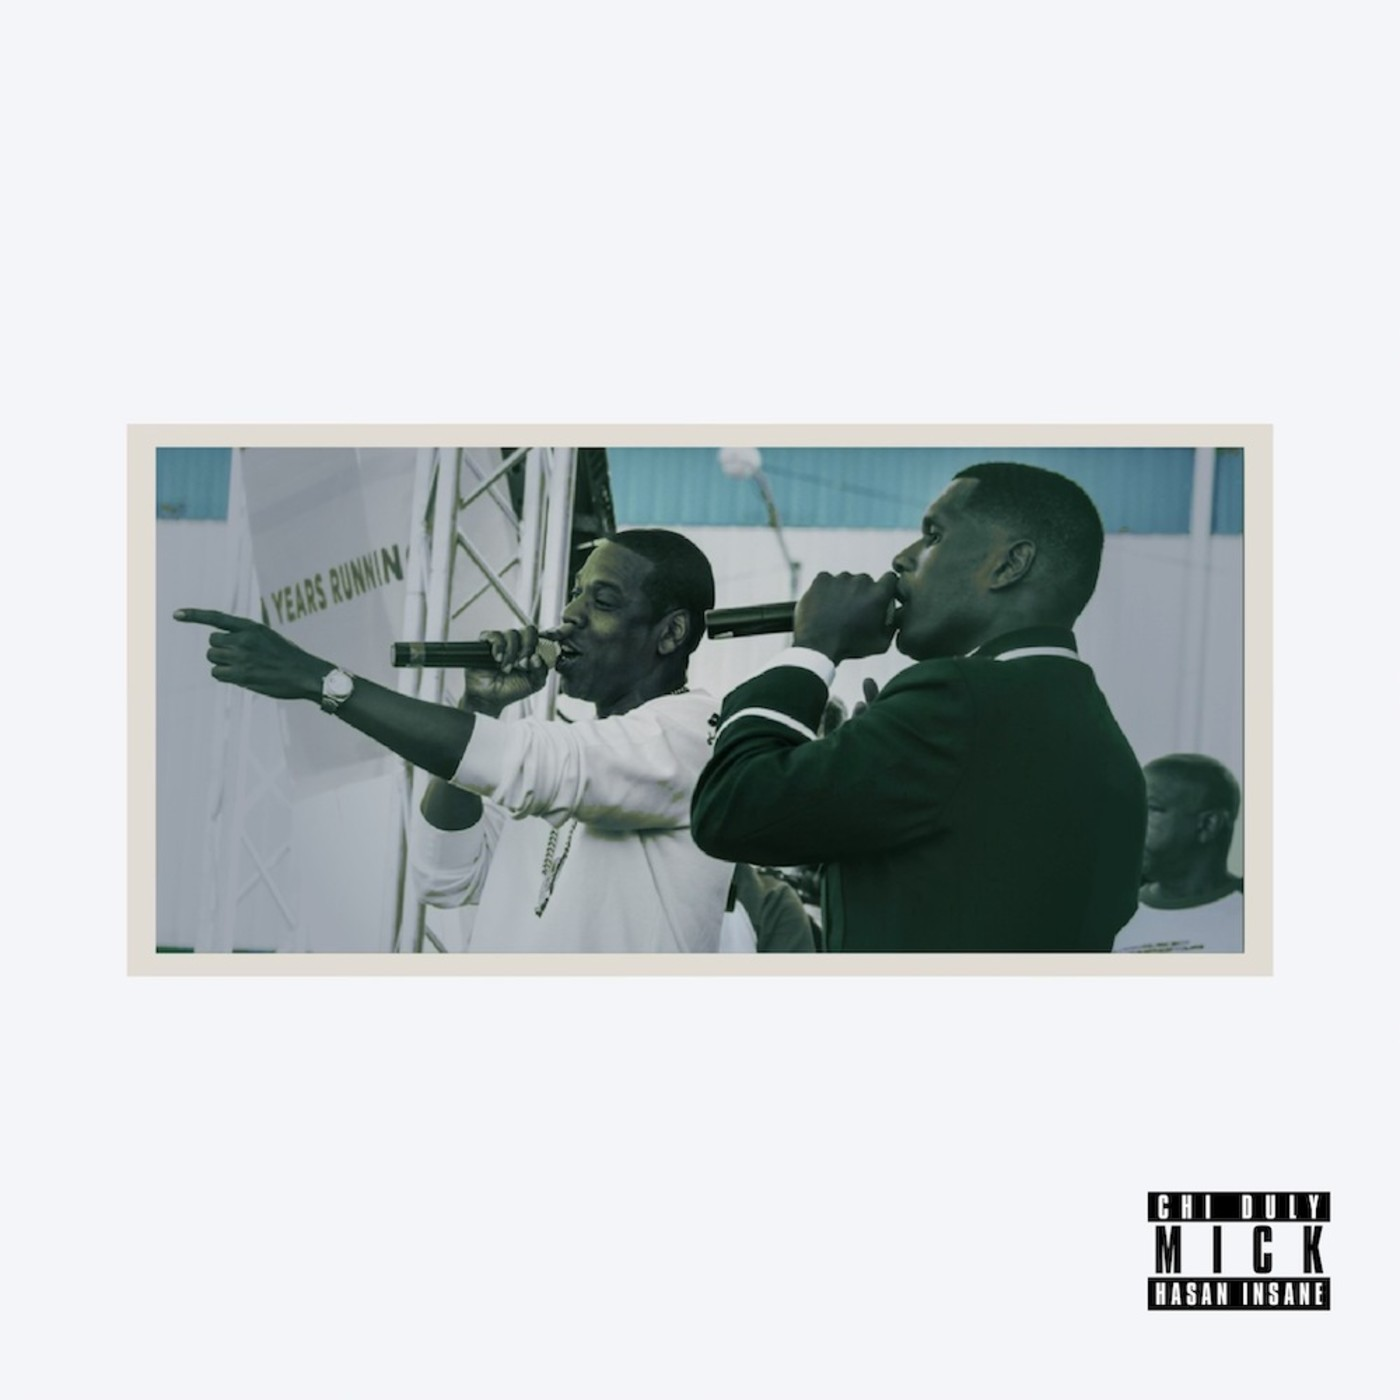 mick-mixtape